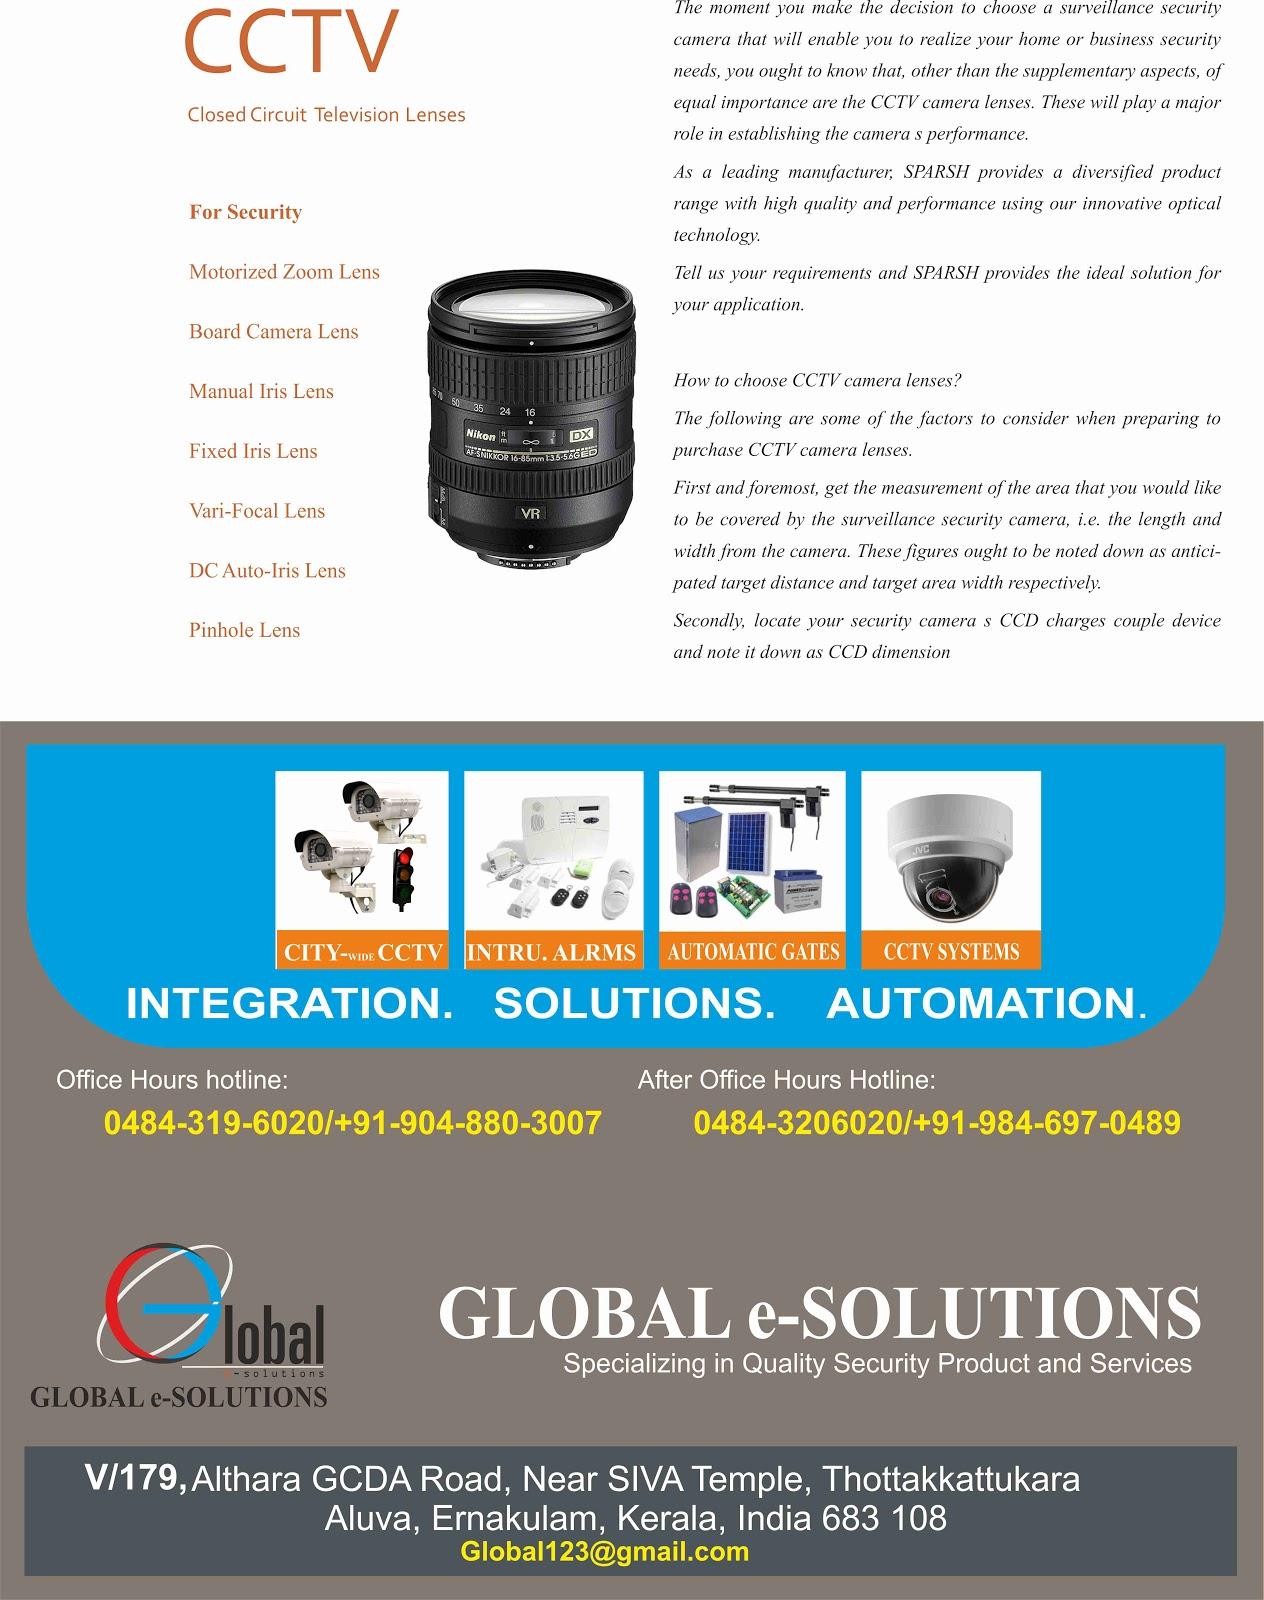 Global e-Solutions: BenQ GH600,